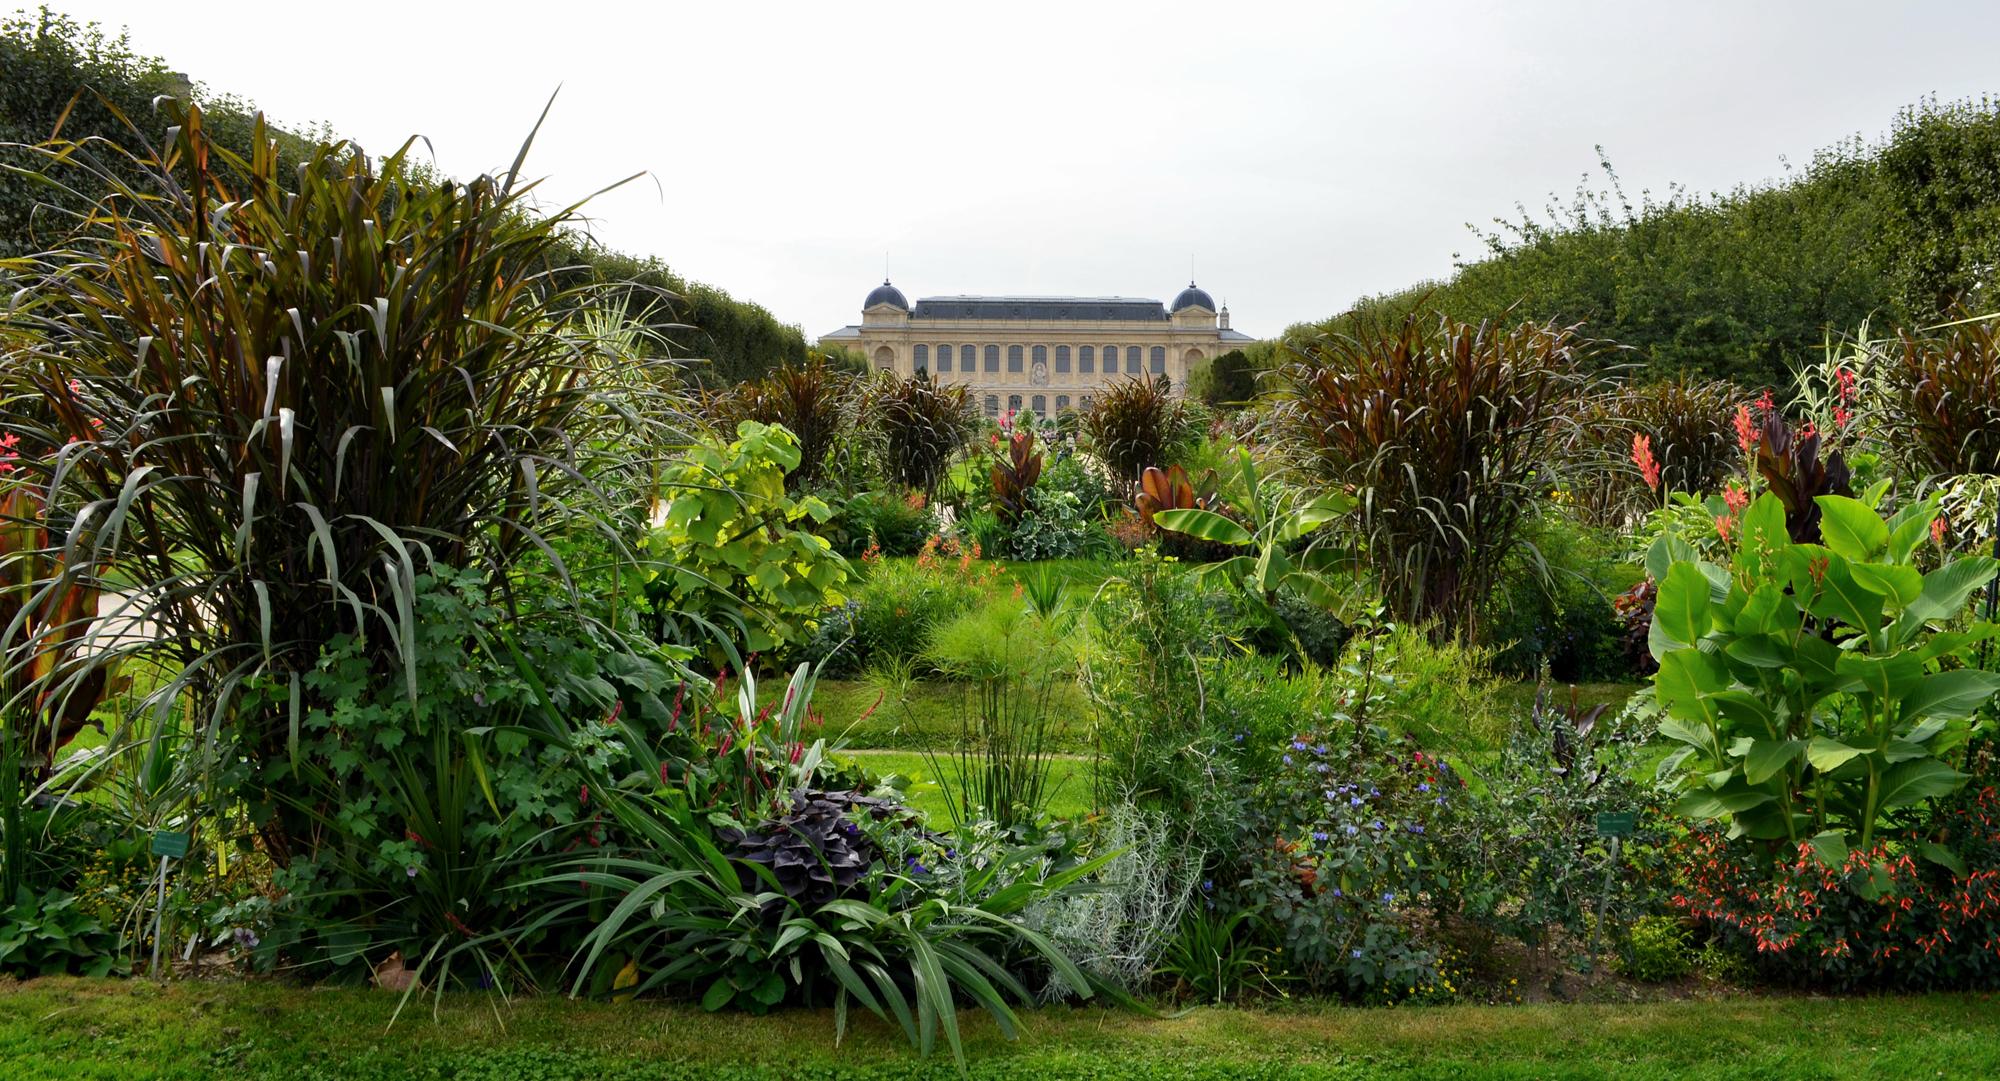 Jardin Des Plantes | Galeries, Jardins, Zoo - Jardin Des Plantes intérieur Plante Pour Jardin Japonais